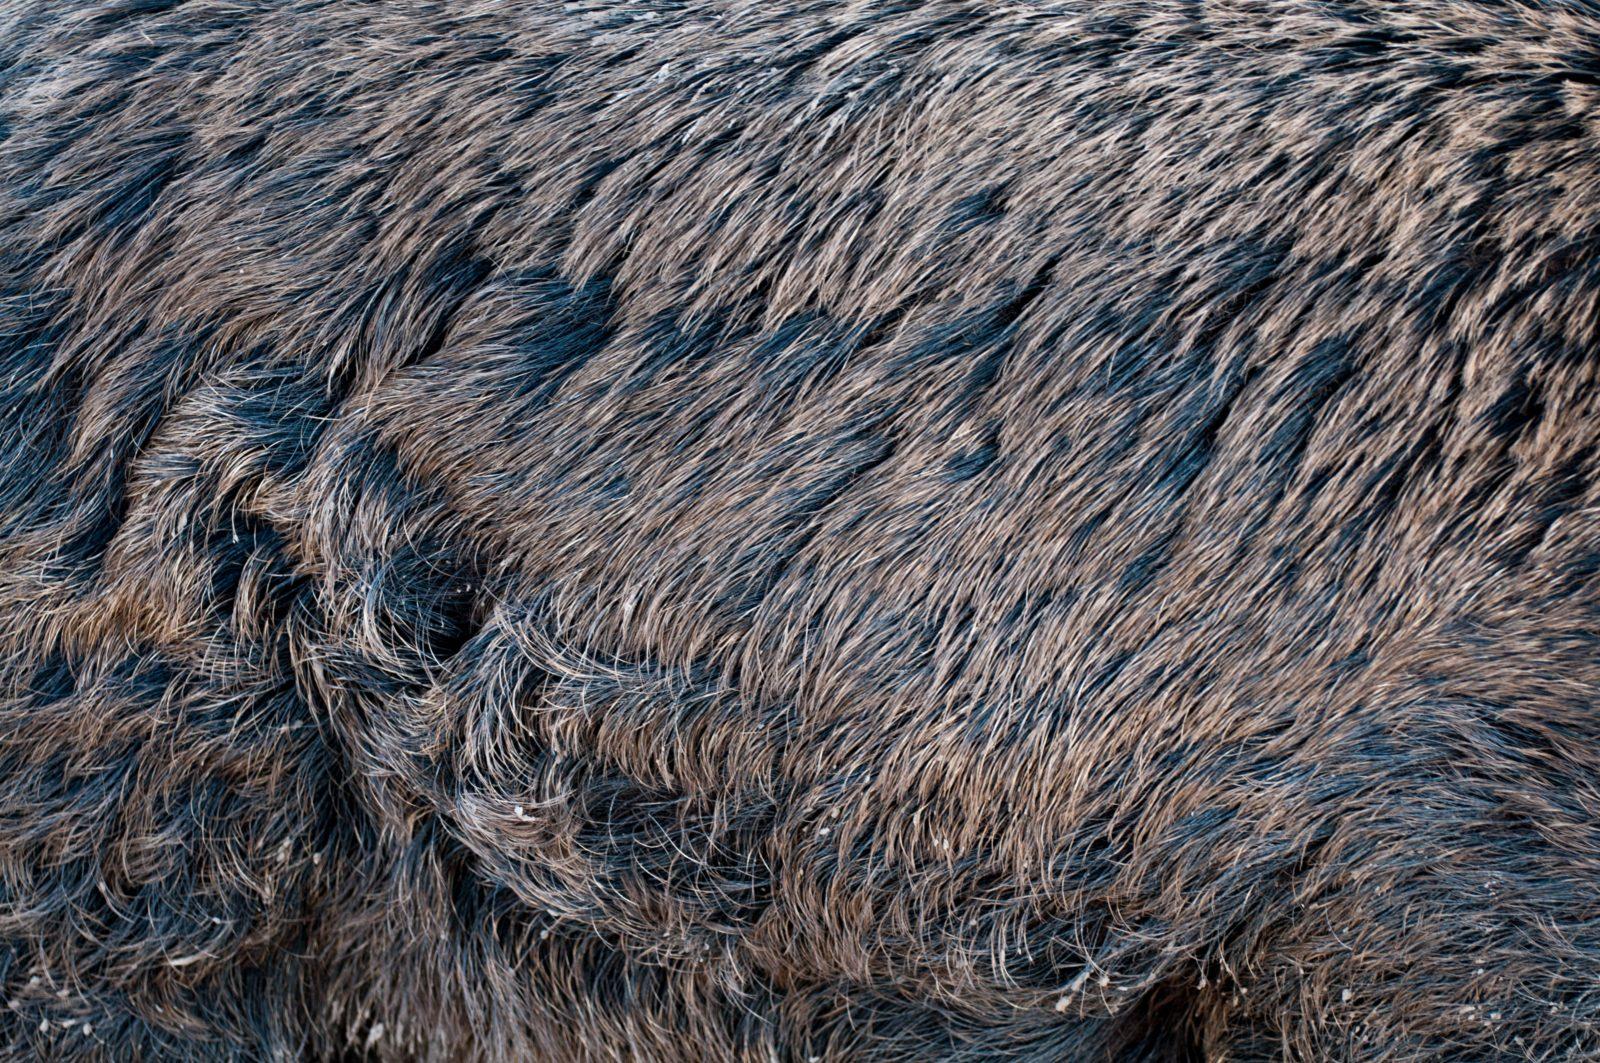 Wild pig fur skin texture close-up